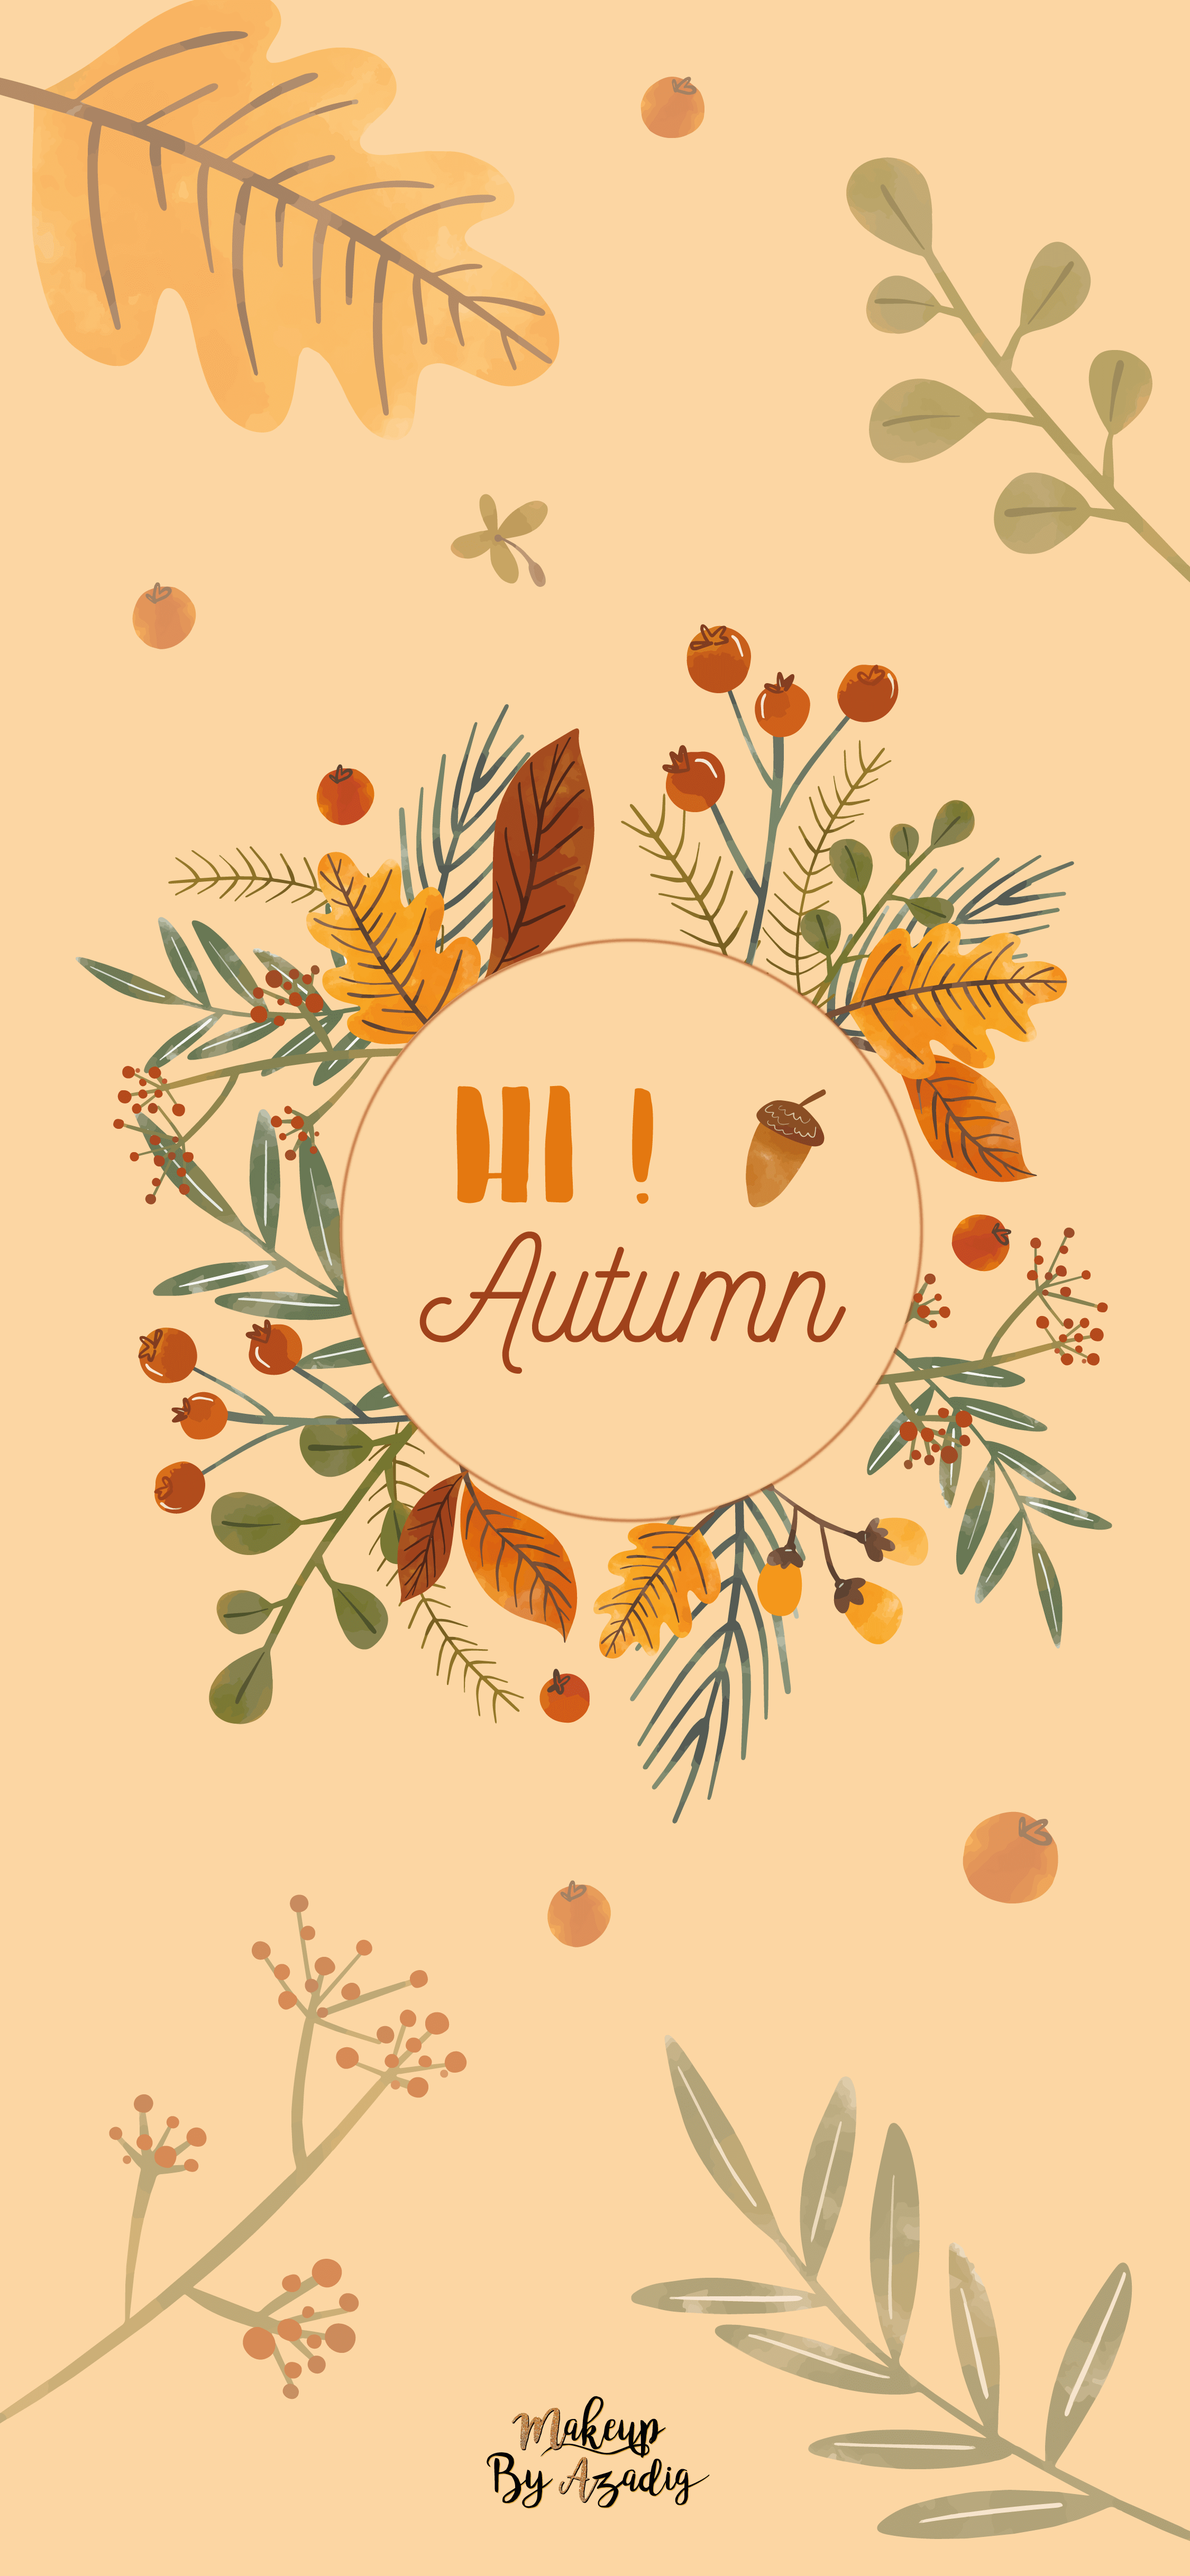 fond-decran-wallpaper-automne-leaves-autumn-girly-iphone-X-makeupbyazadig-tendance